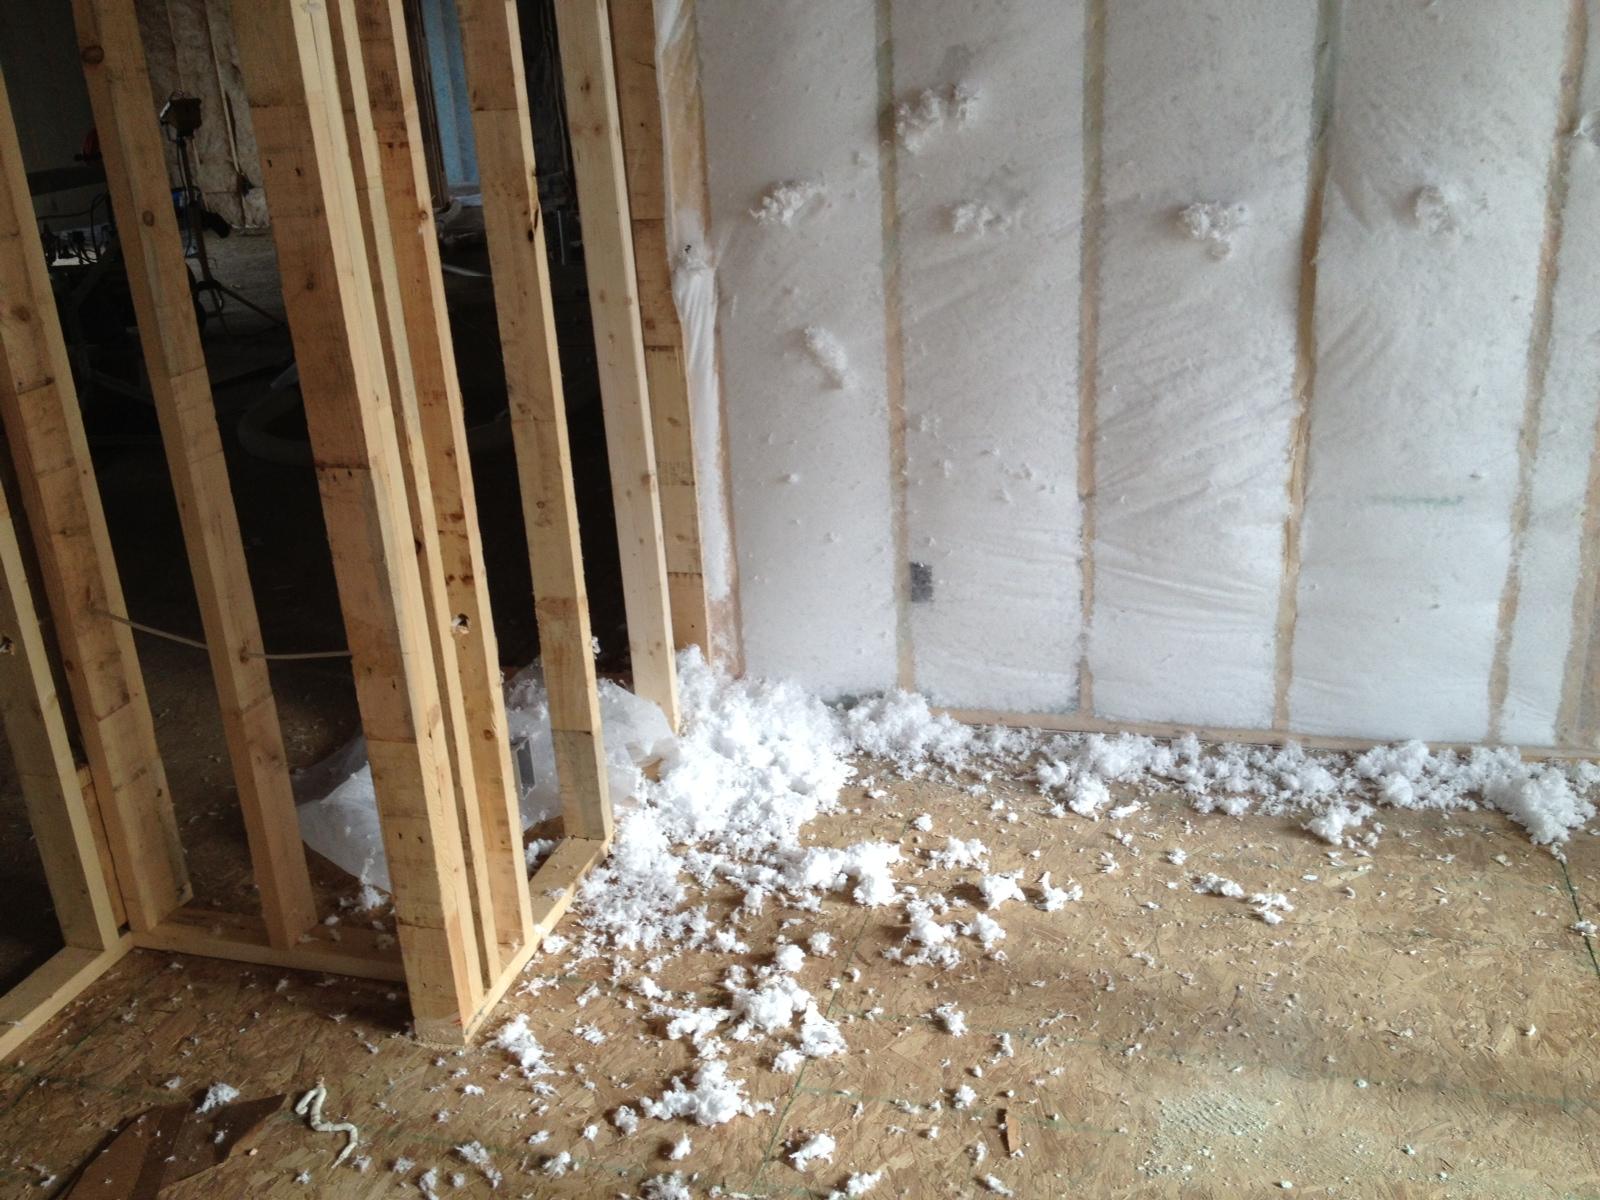 Deck The Halls With Wires And Sawdust Fa La La La La La